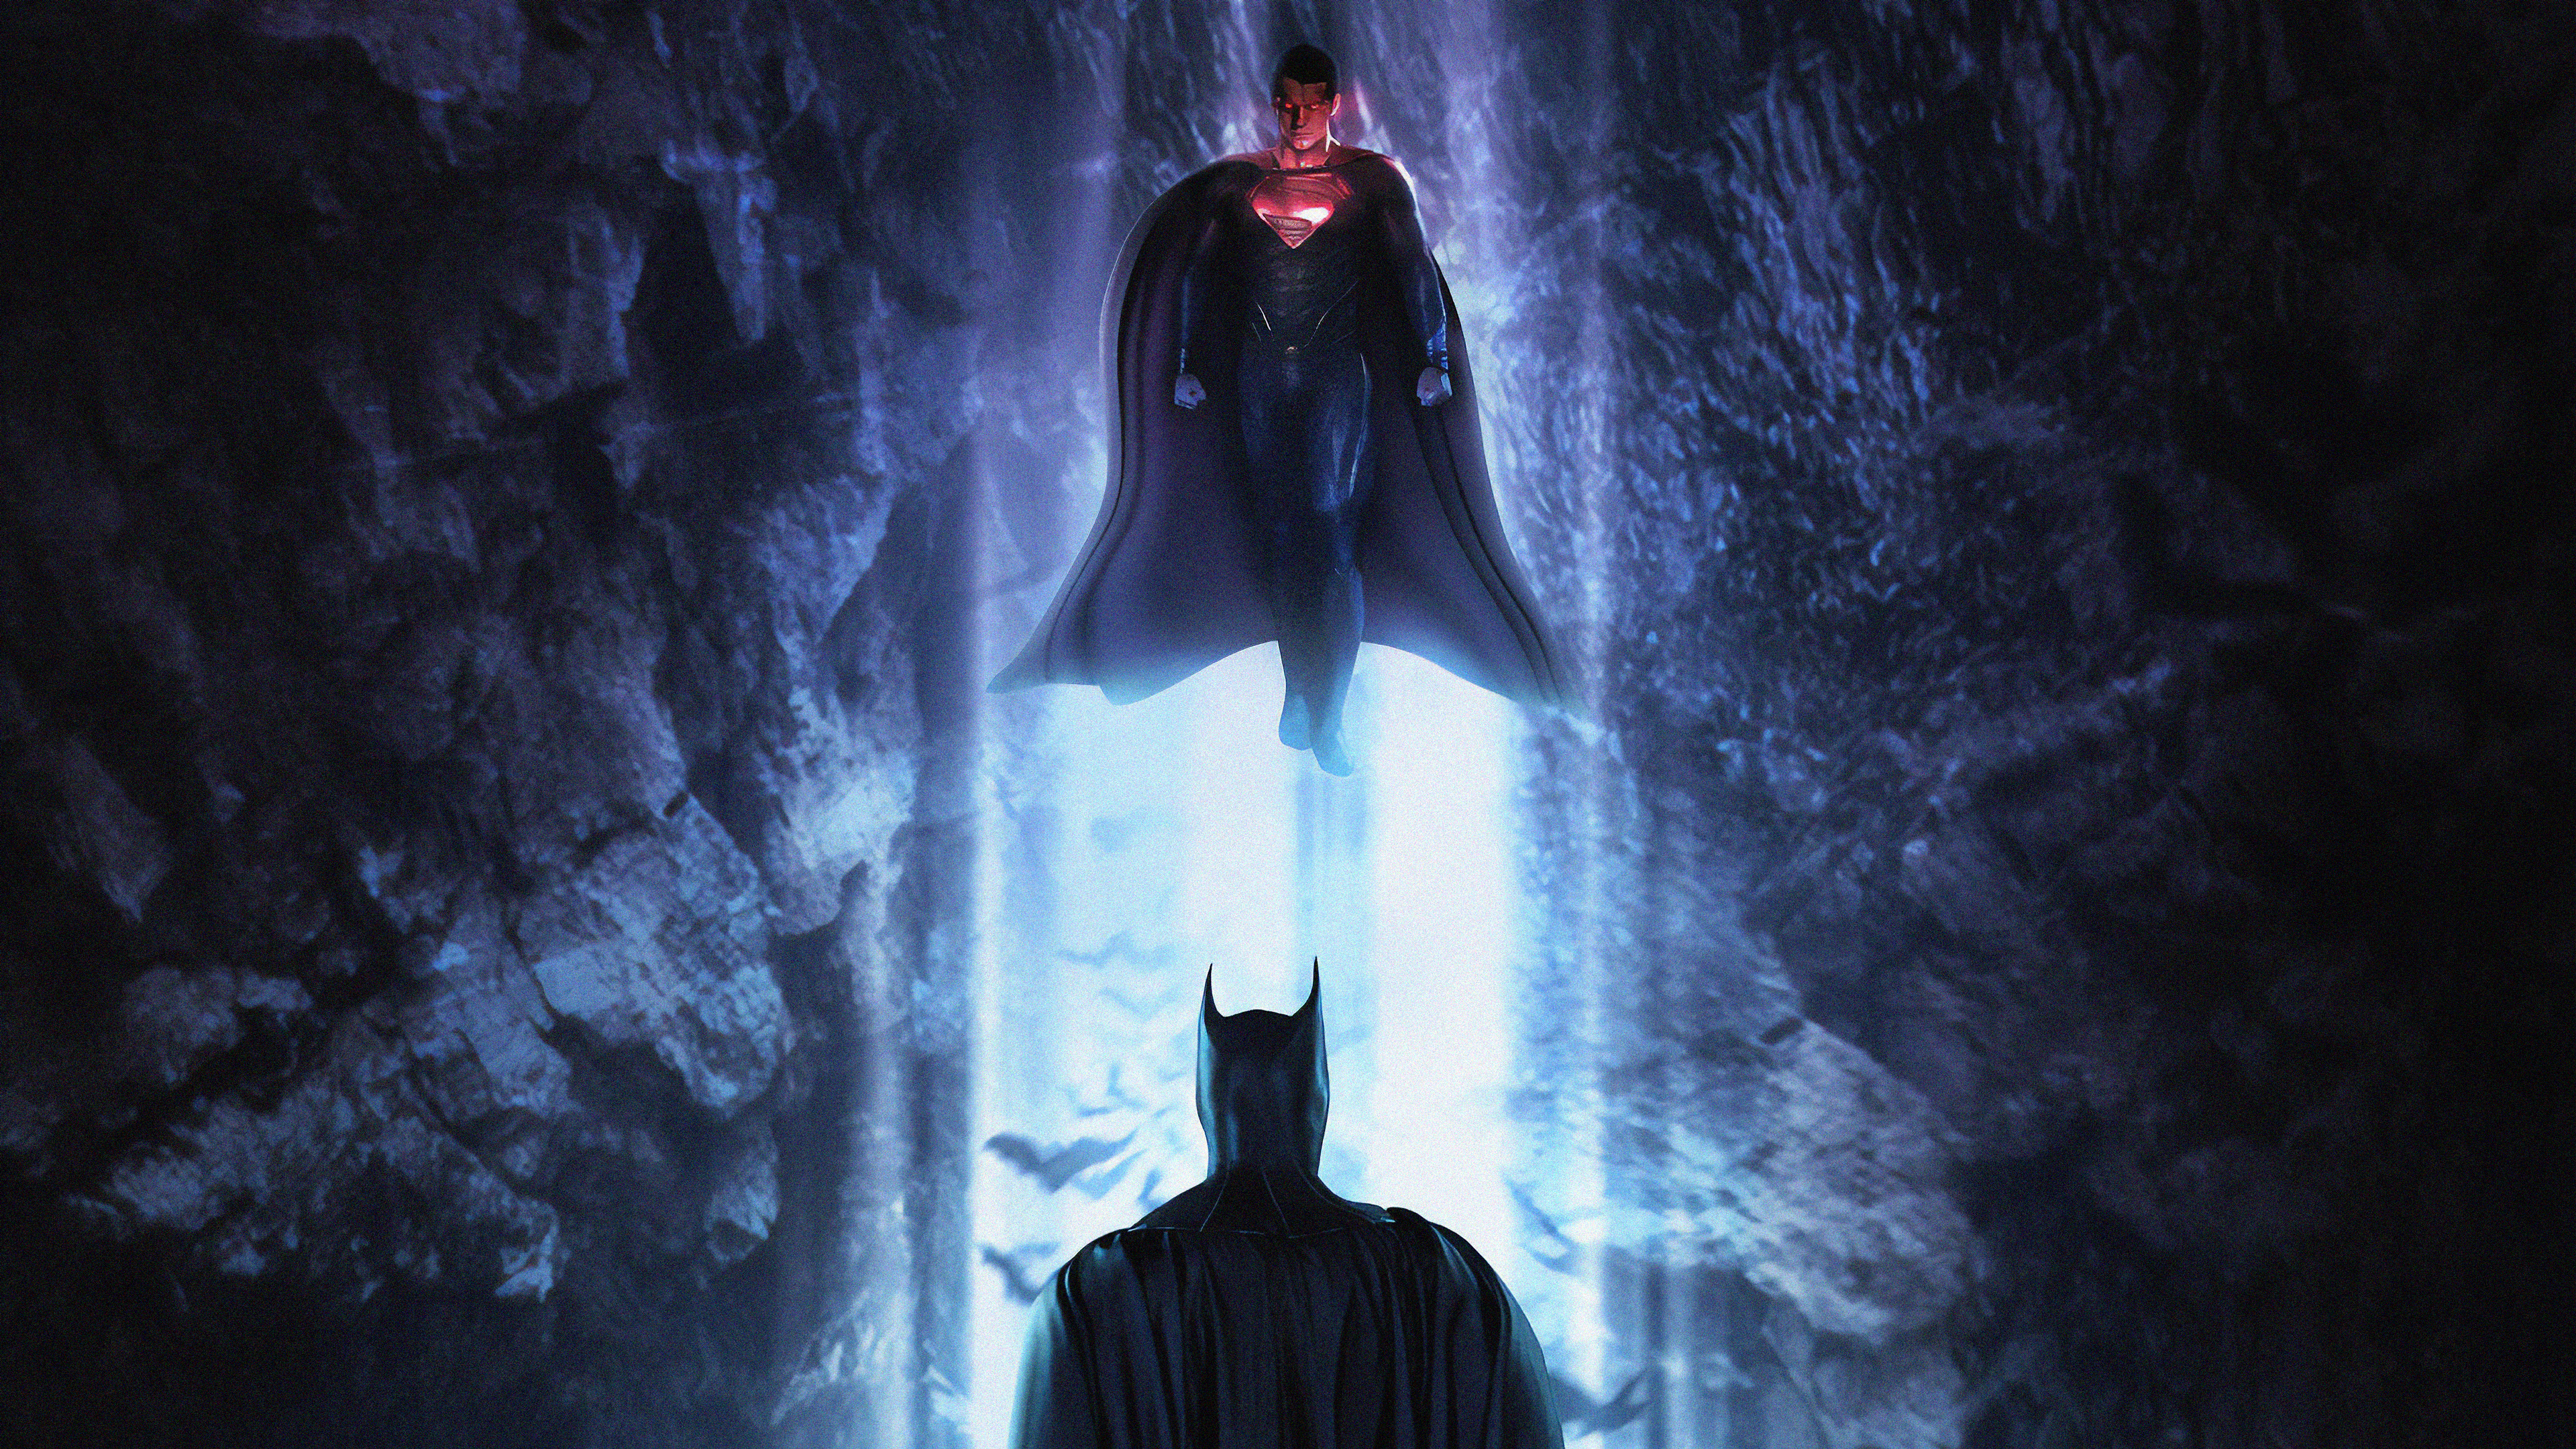 batman and superman art 1563220384 - Batman And Superman Art - superman wallpapers, superheroes wallpapers, hd-wallpapers, digital art wallpapers, batman wallpapers, artwork wallpapers, 4k-wallpapers